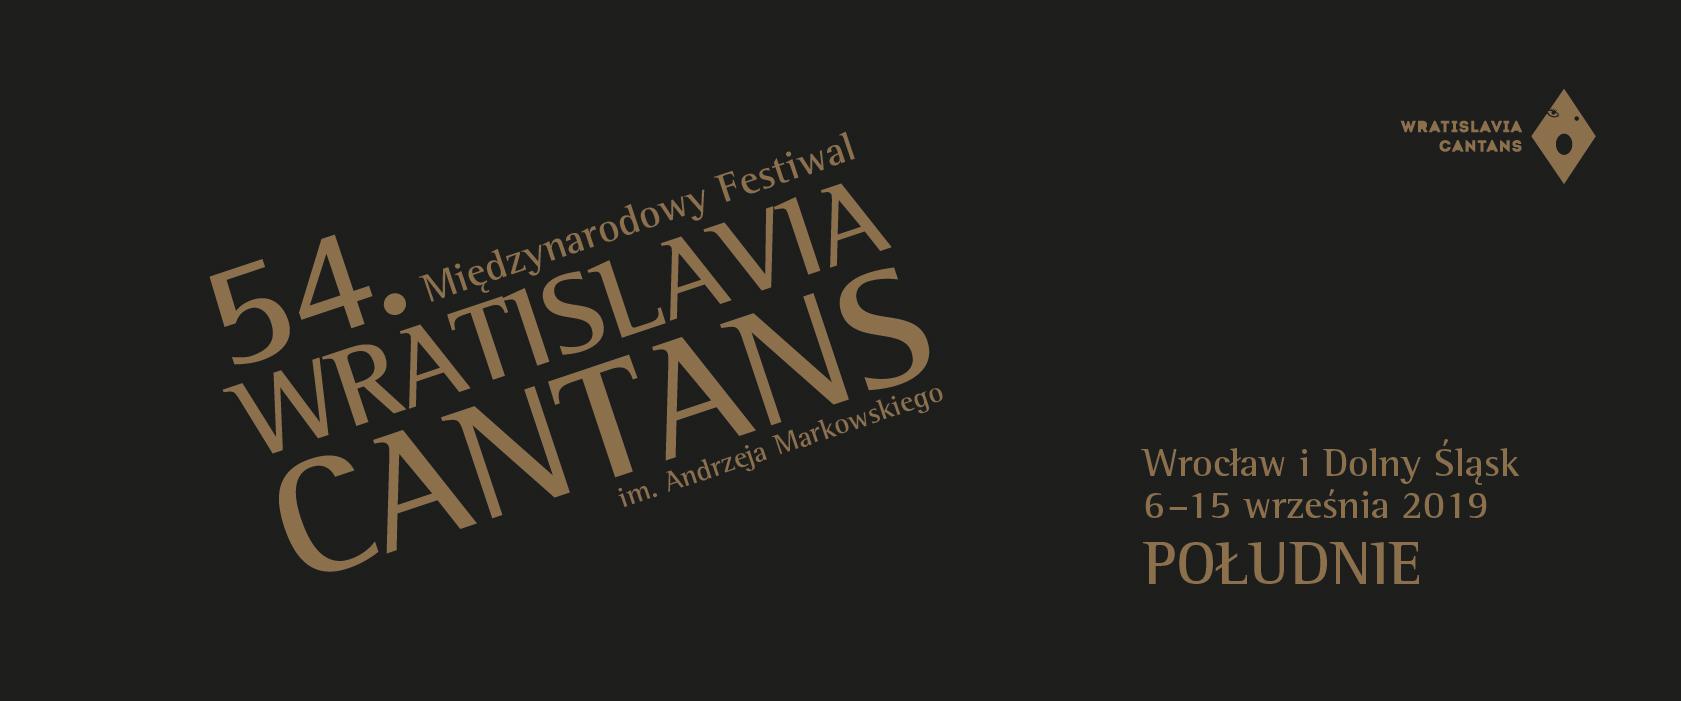 International Festival Wratislavia Cantans 2019  Tickets